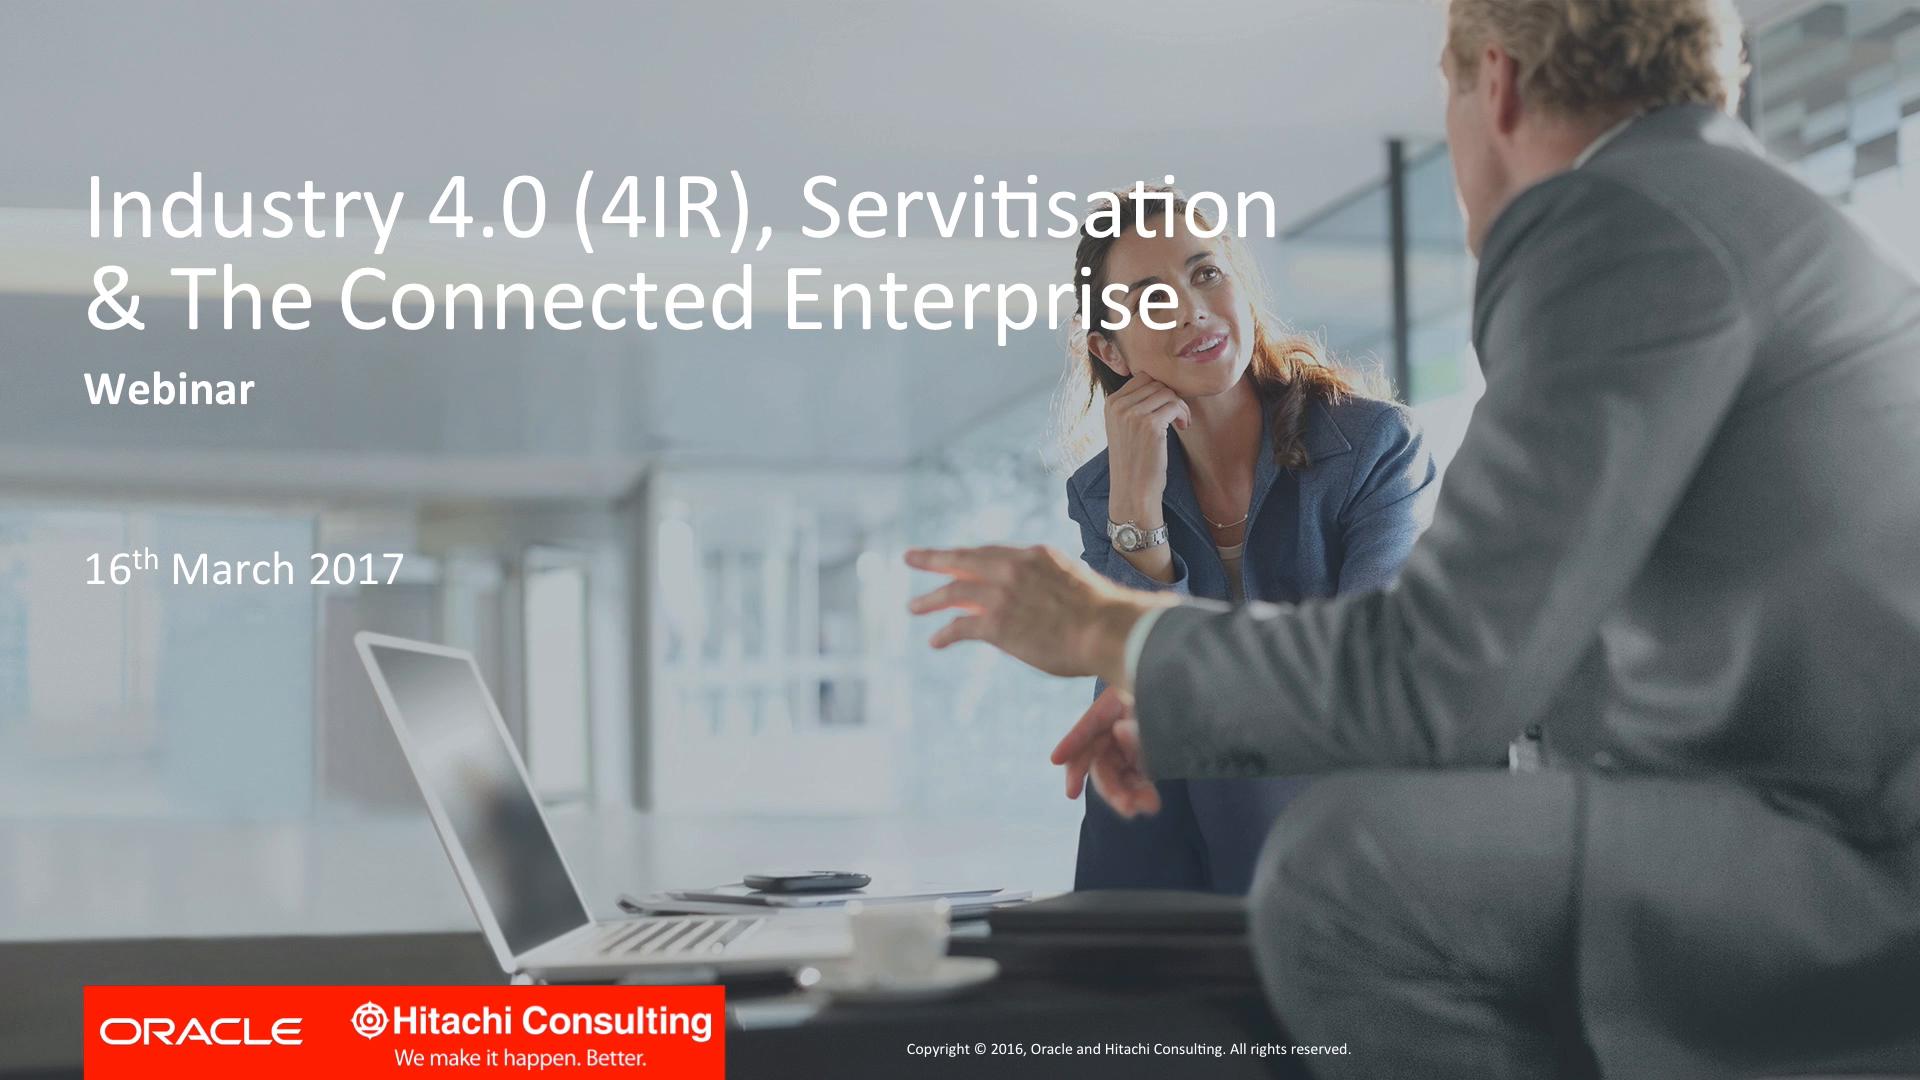 4IR: Servitisation & Connected Enterprise